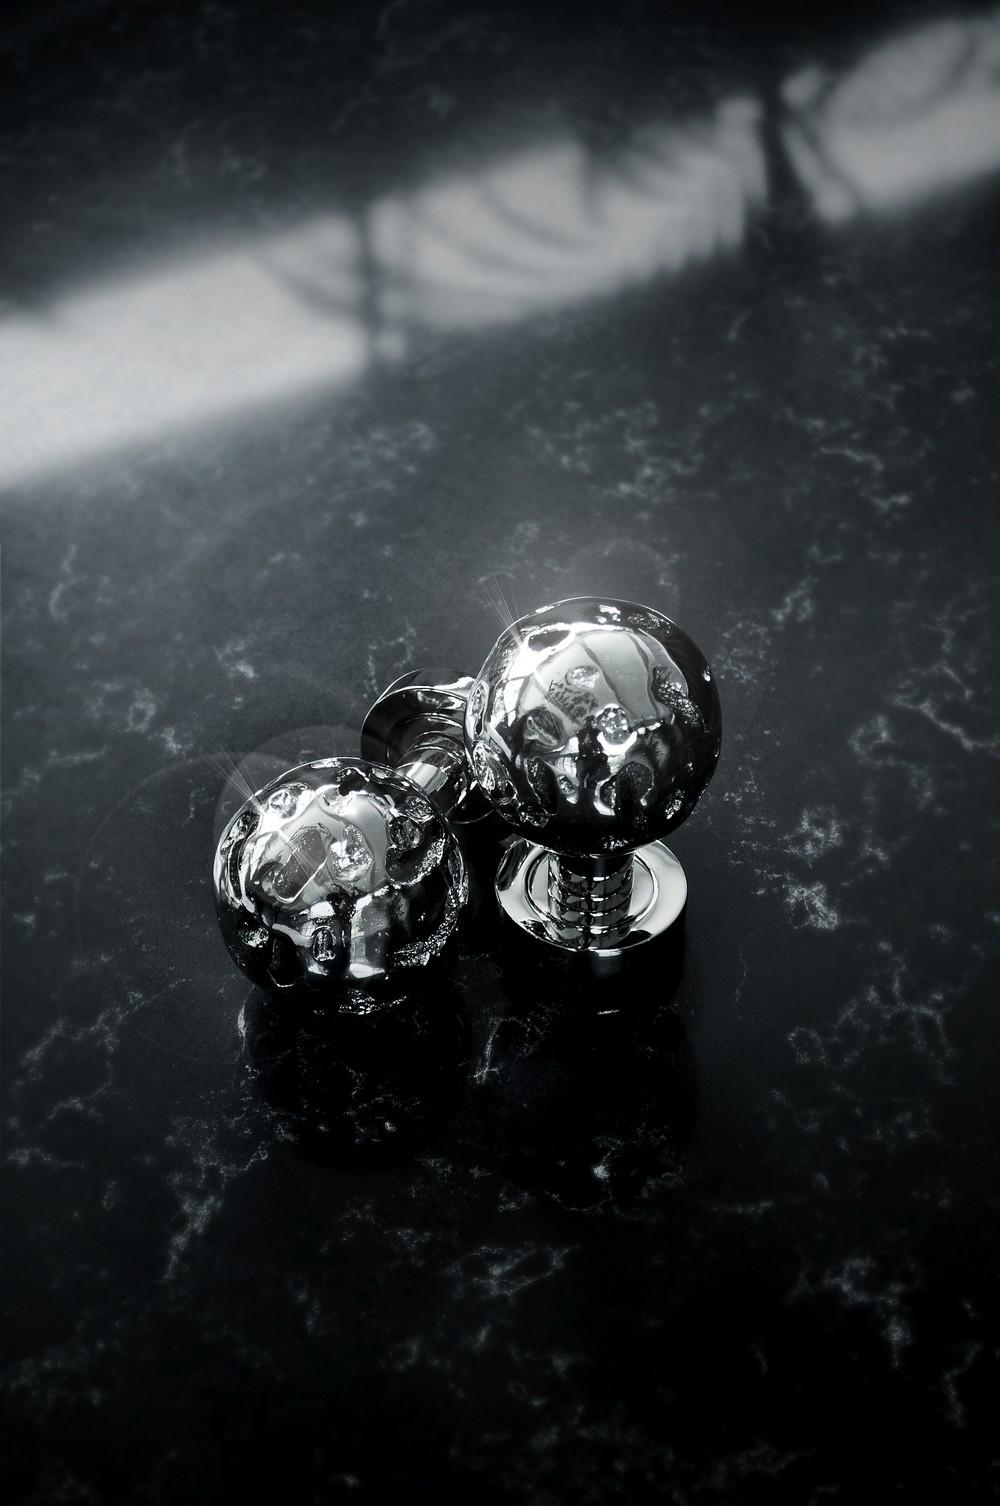 Admire 9 Exclusive Decorative Hardware Pieces in Lustrous Silver Tones 8